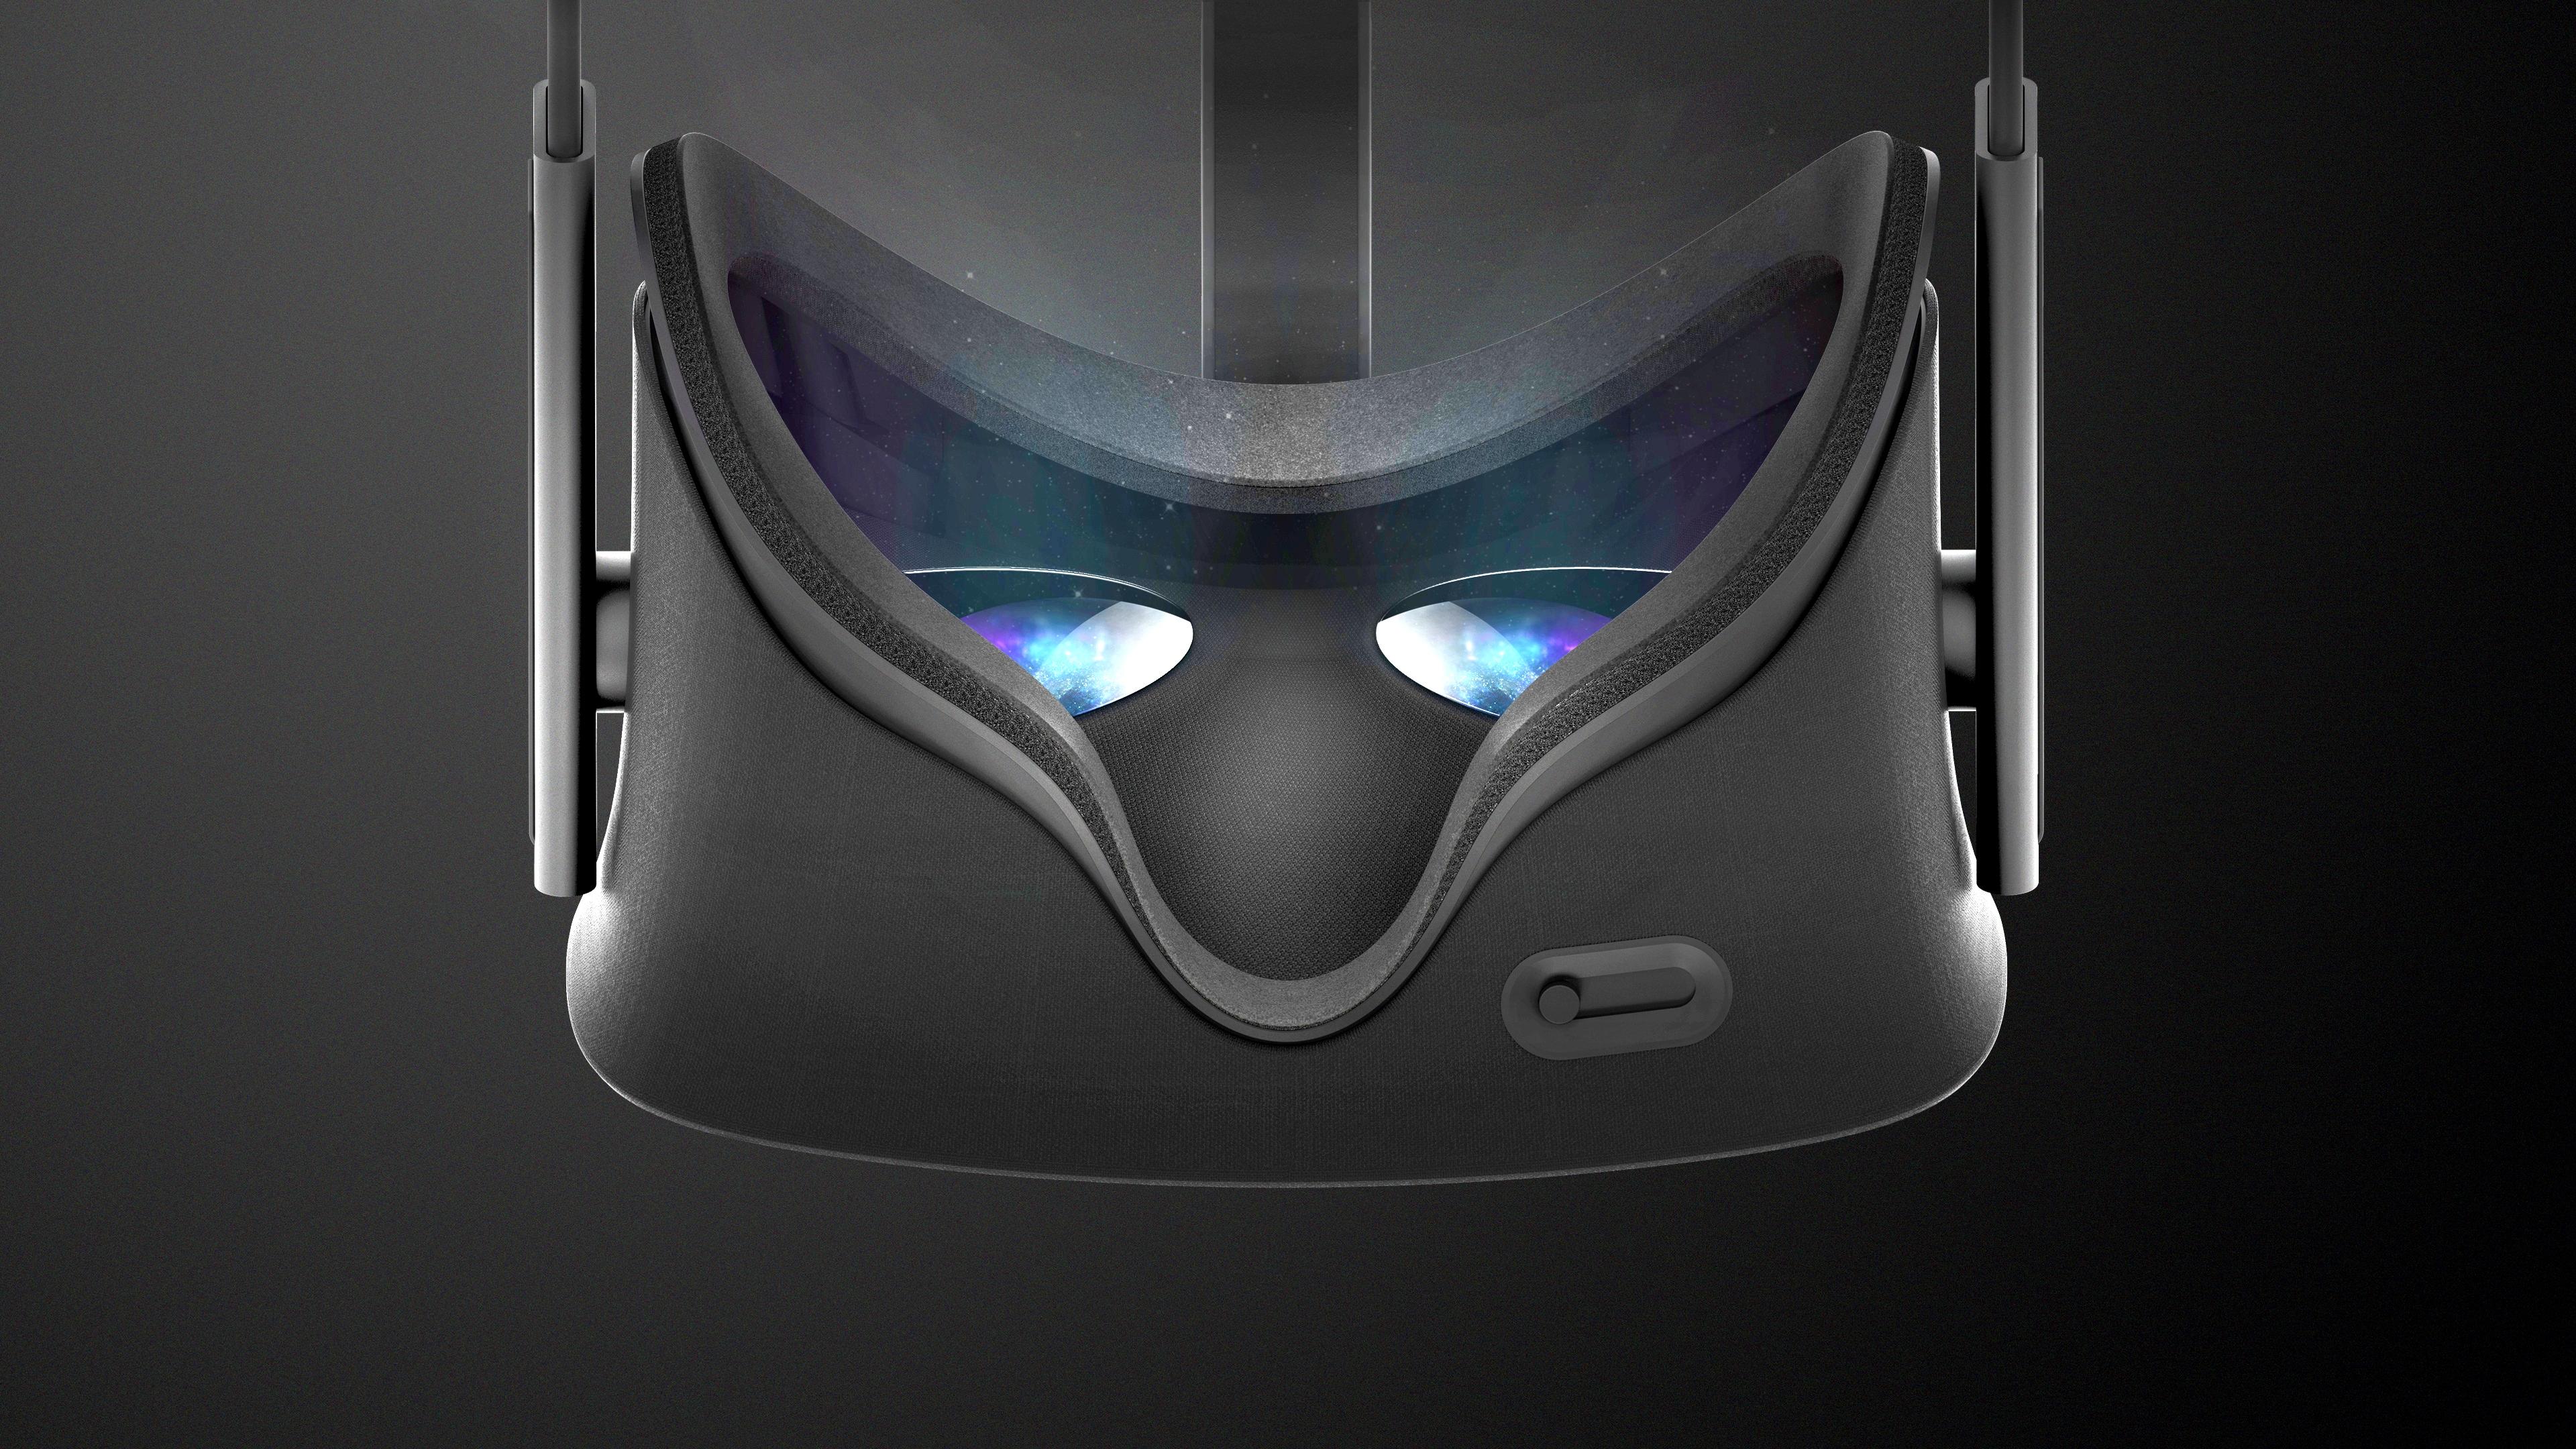 Oculus Targets Q1 2016 for Consumer Oculus Rift